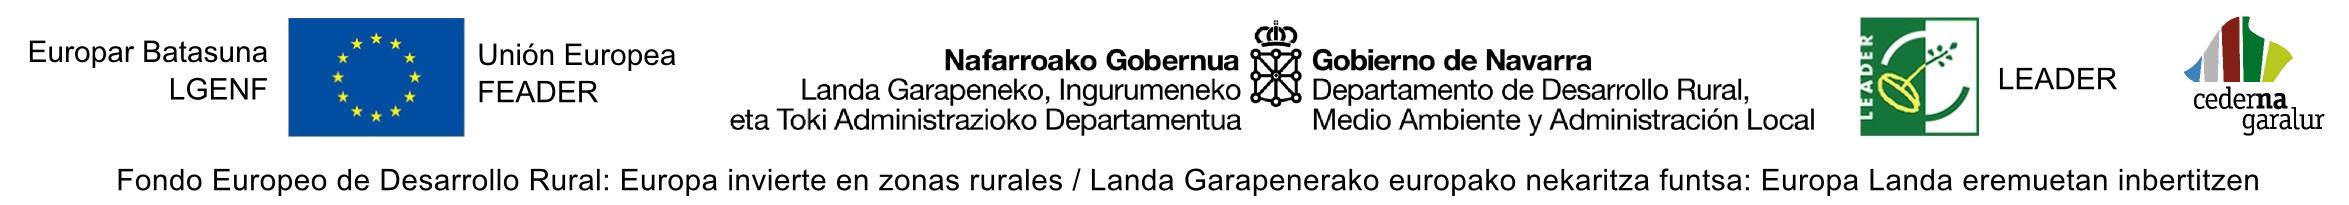 logos_pdr_300ppp_bilingue